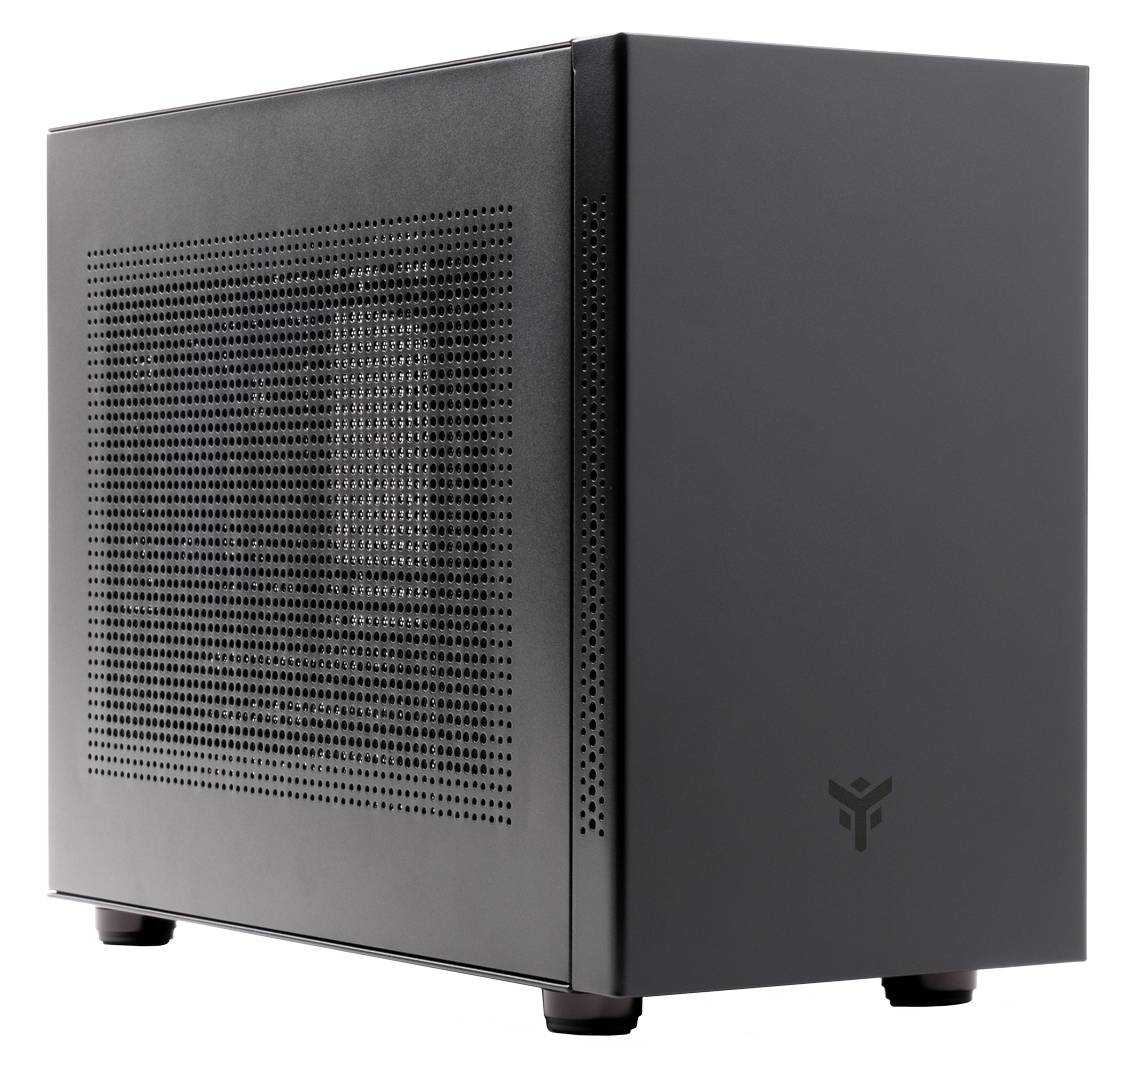 itek EVOKE and Vertibra Q210: here are the new elegant cases